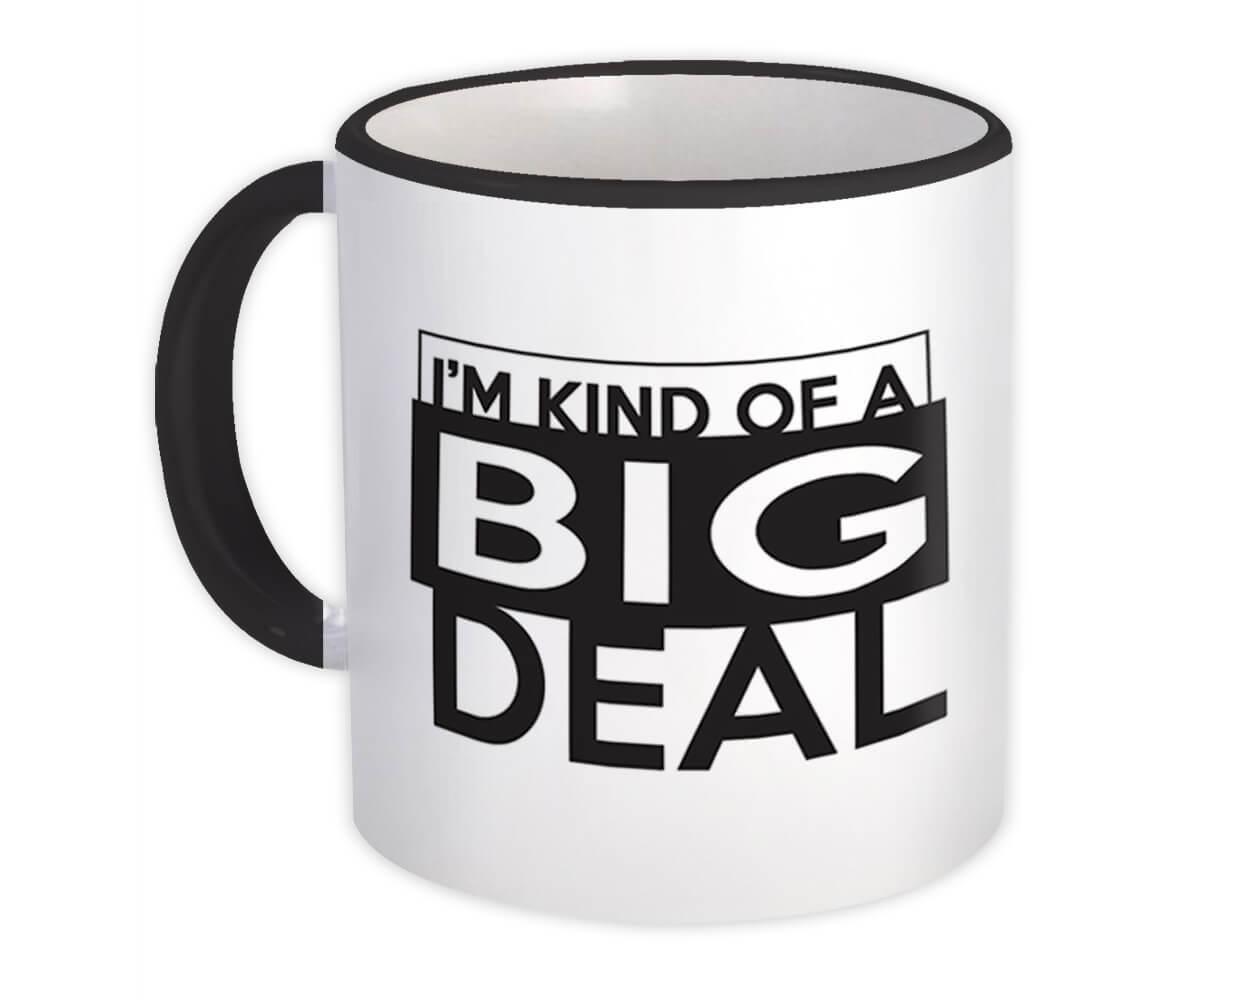 I am Kind of a Big Deal : Gift Mug Funny Work Office Coworker Friend Joke